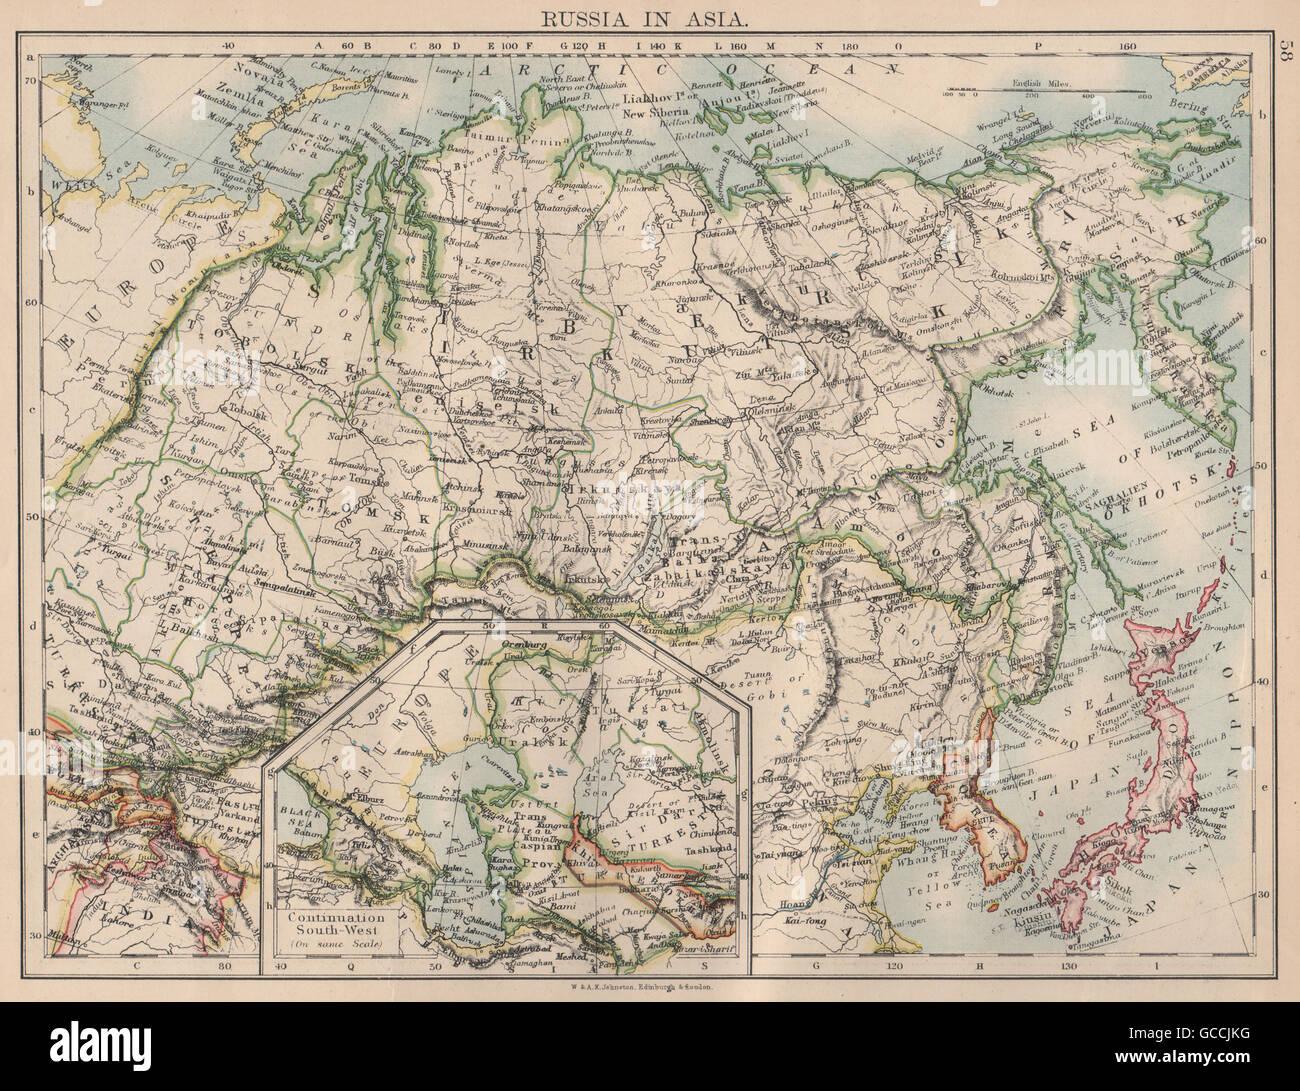 Asia Map Siberia.Russia In Asia Siberia Central Asia Caspian Sea Irkutsk Johnston